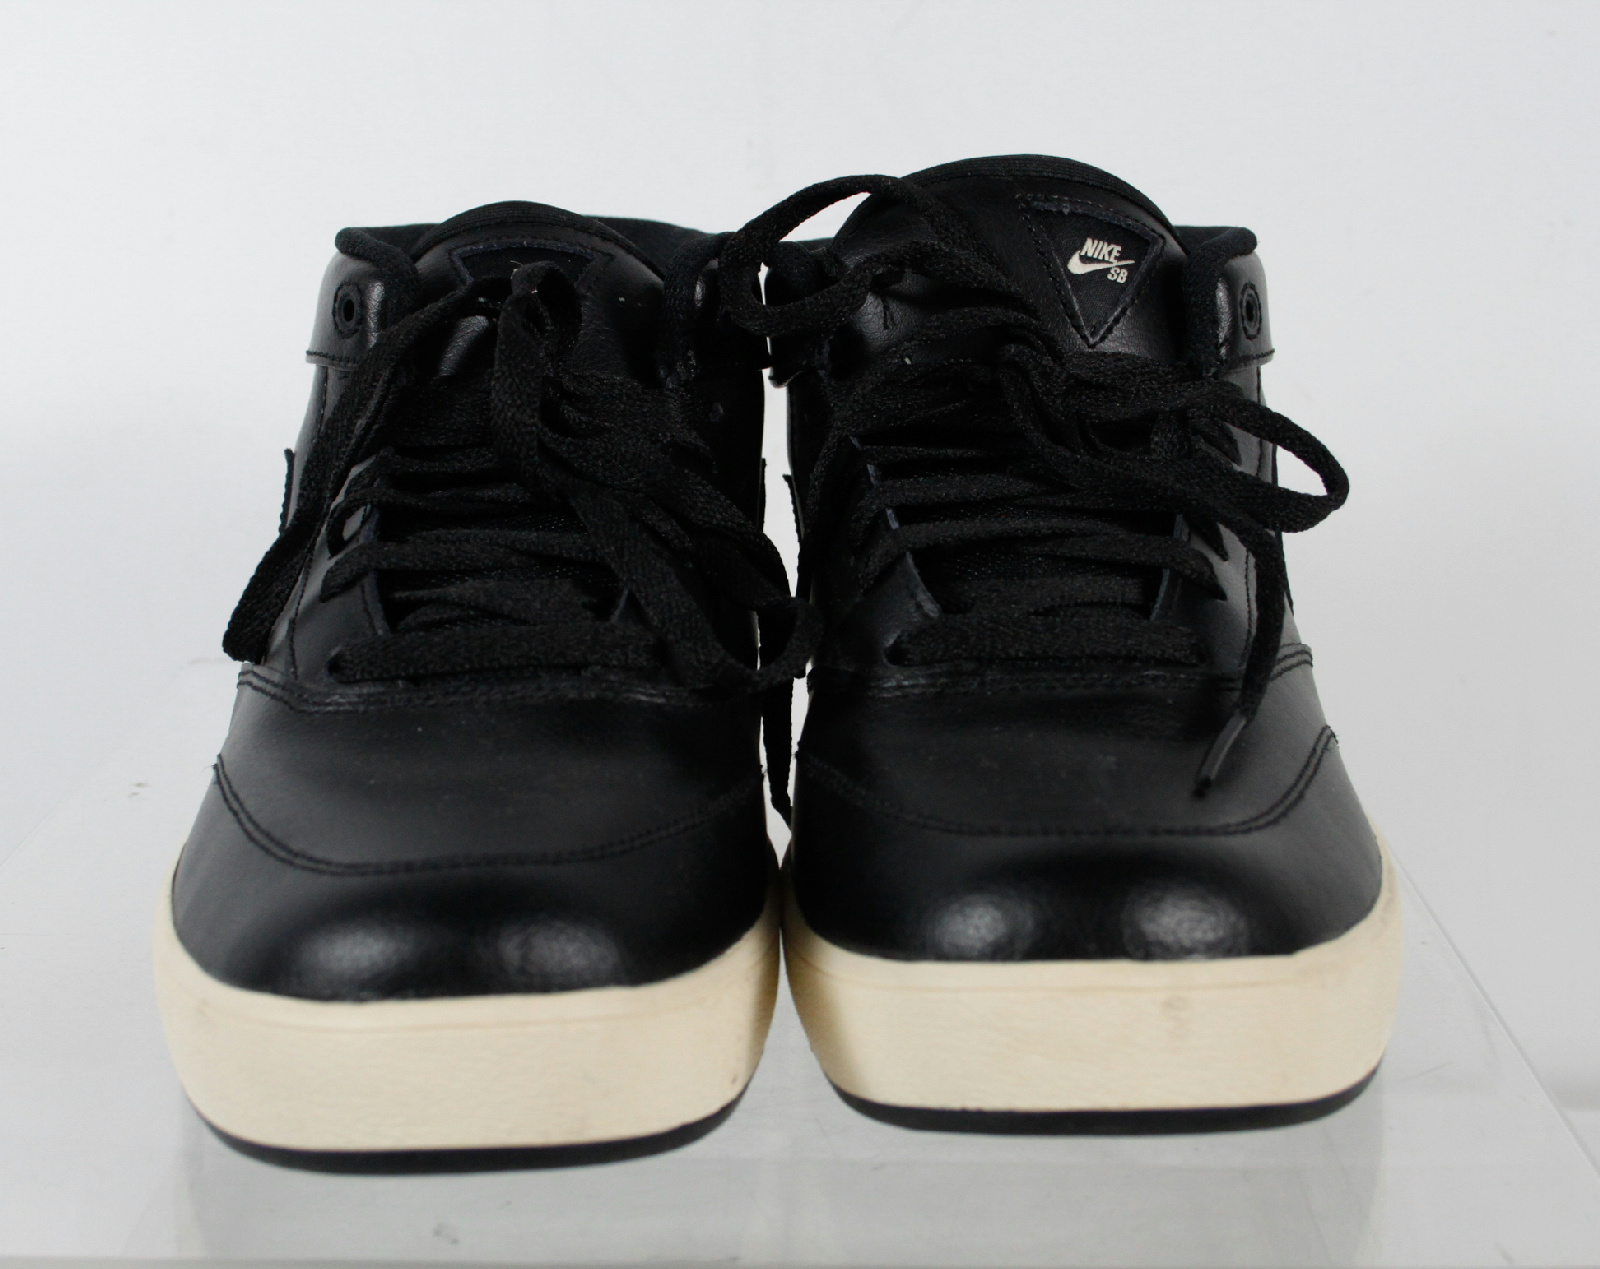 nike omar alazar solid black white bottom laces tennis